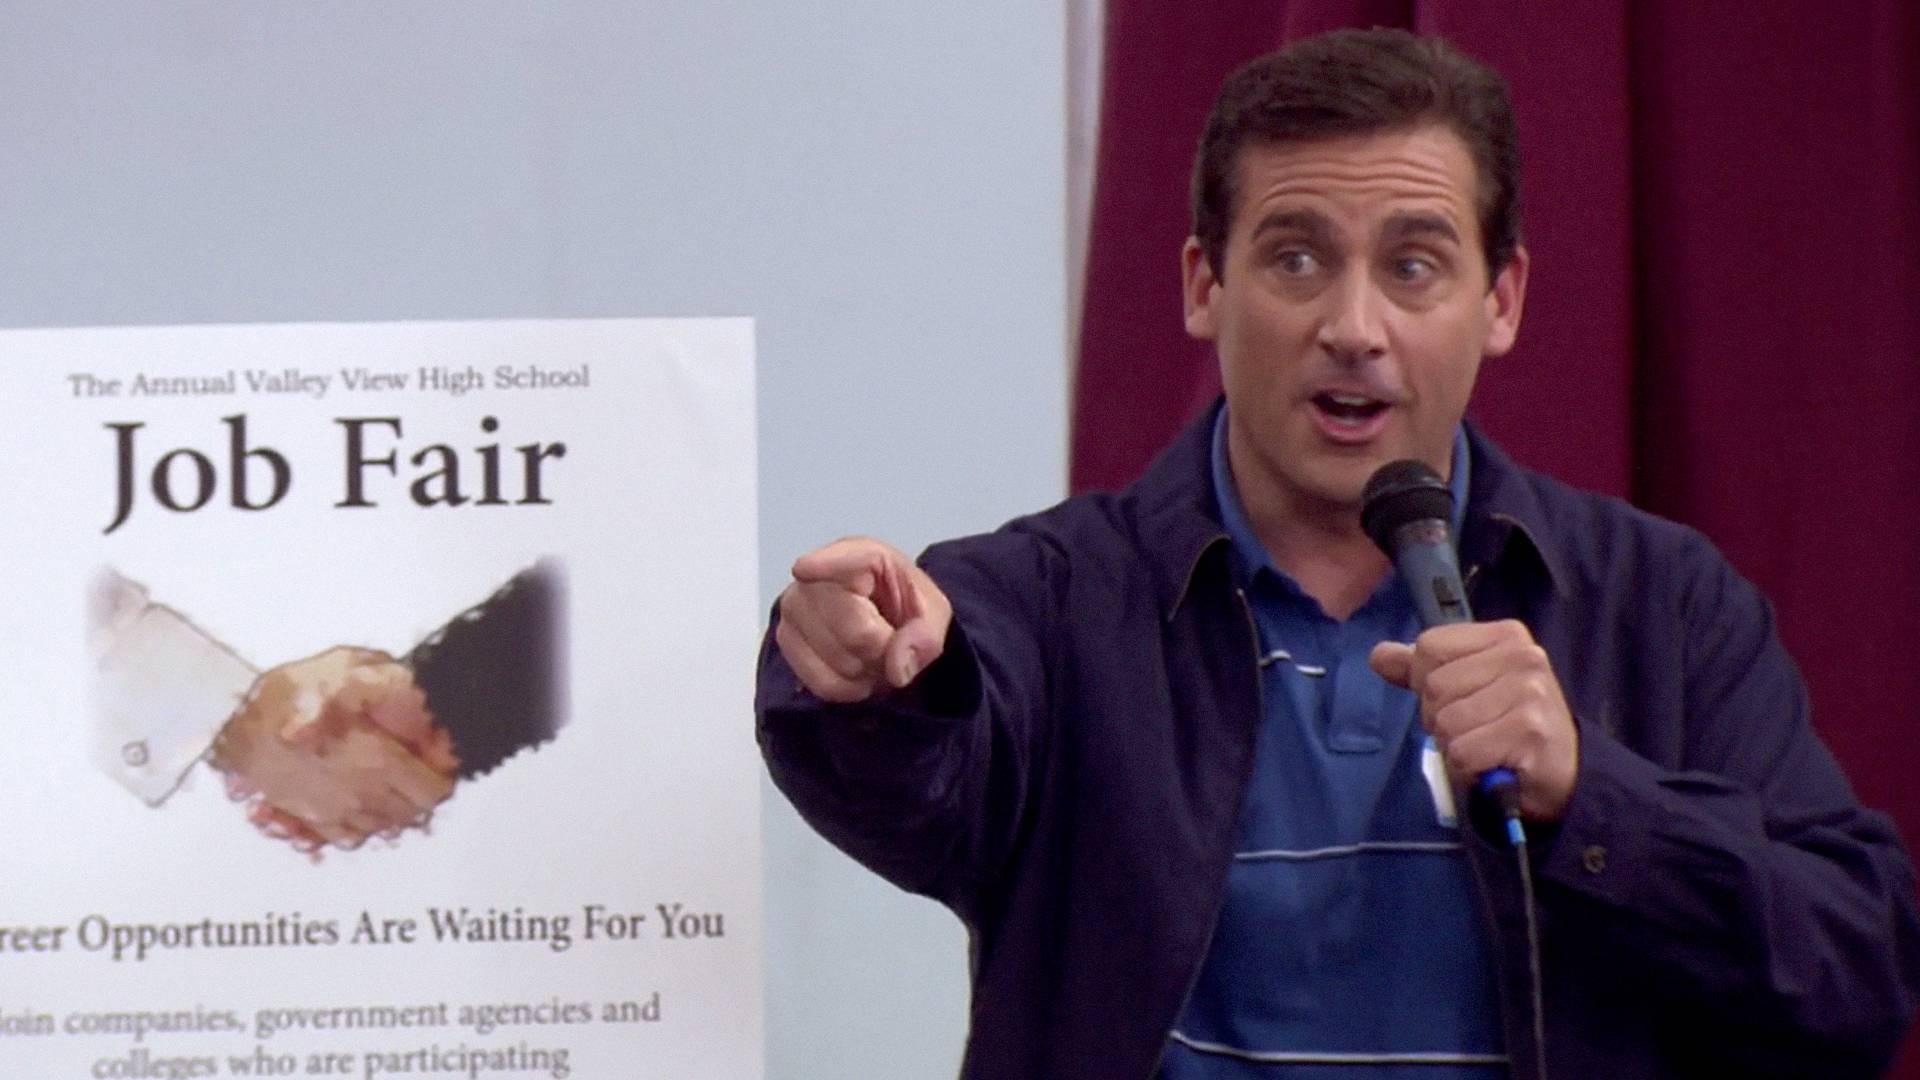 The Office Season 4 Episode 17